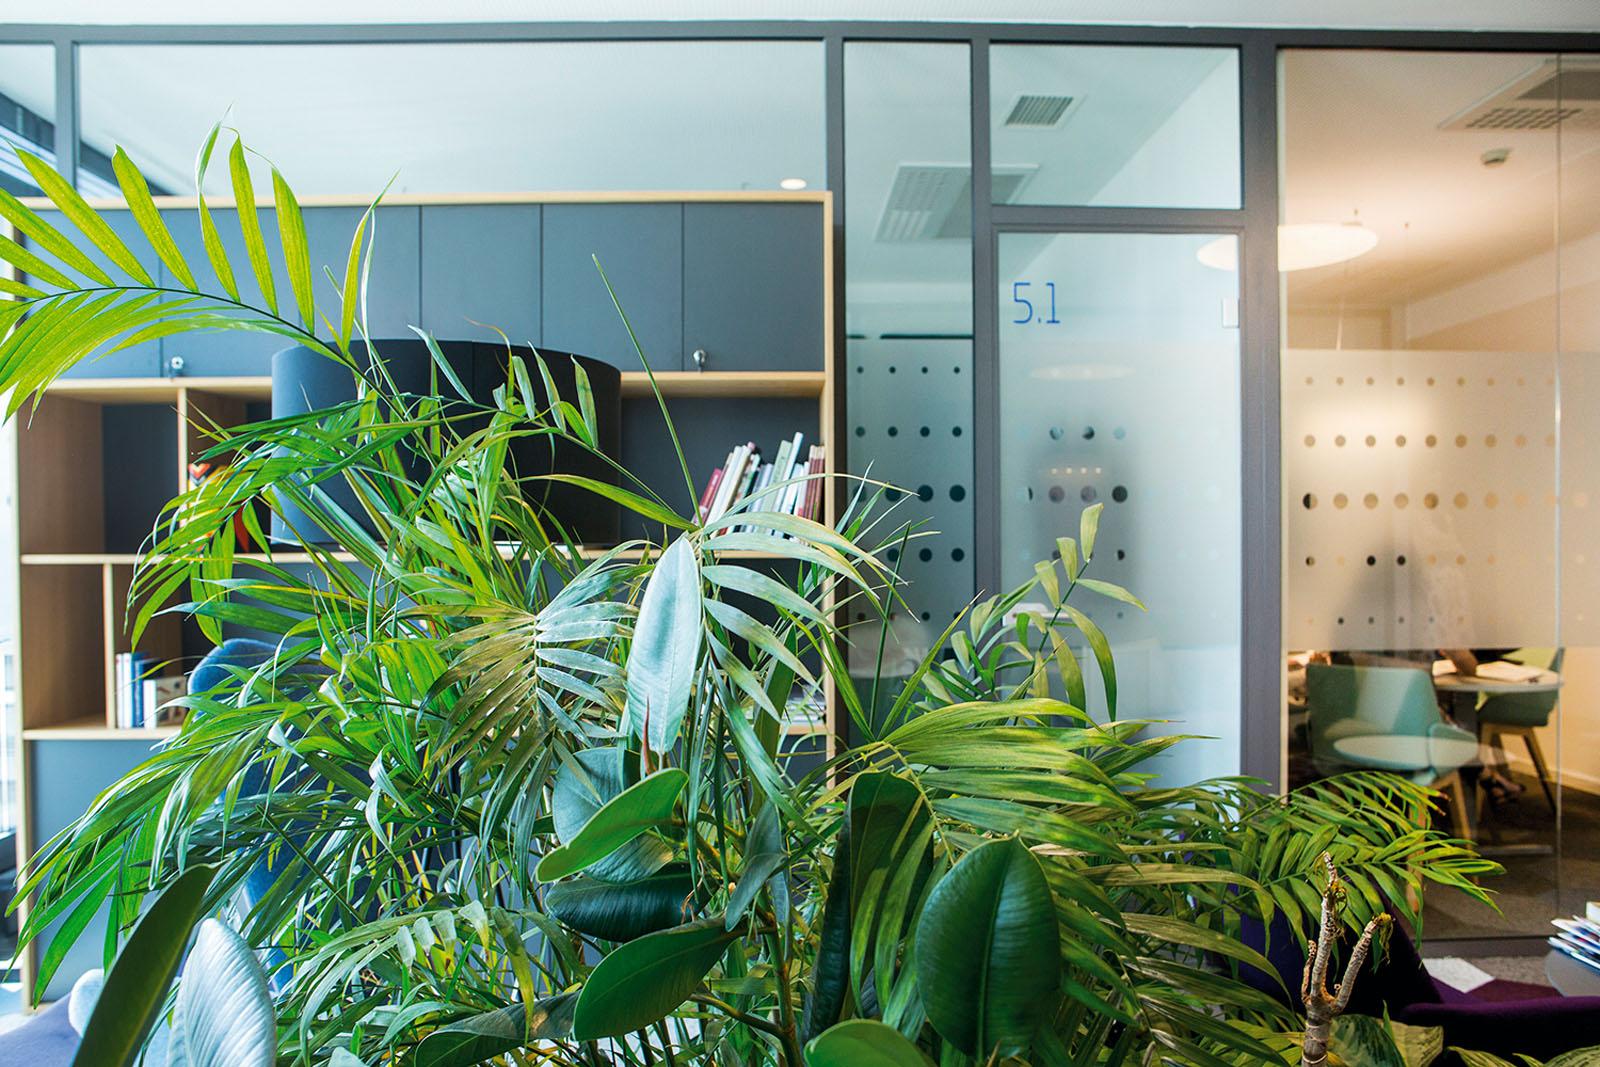 Zagreb, 120619. Novouredjeni prostor Erste banke u poslovnom objektu Eurotower centra napravio je studio Atelier Hrzic. Foto: Berislava Picek/ CROPIX